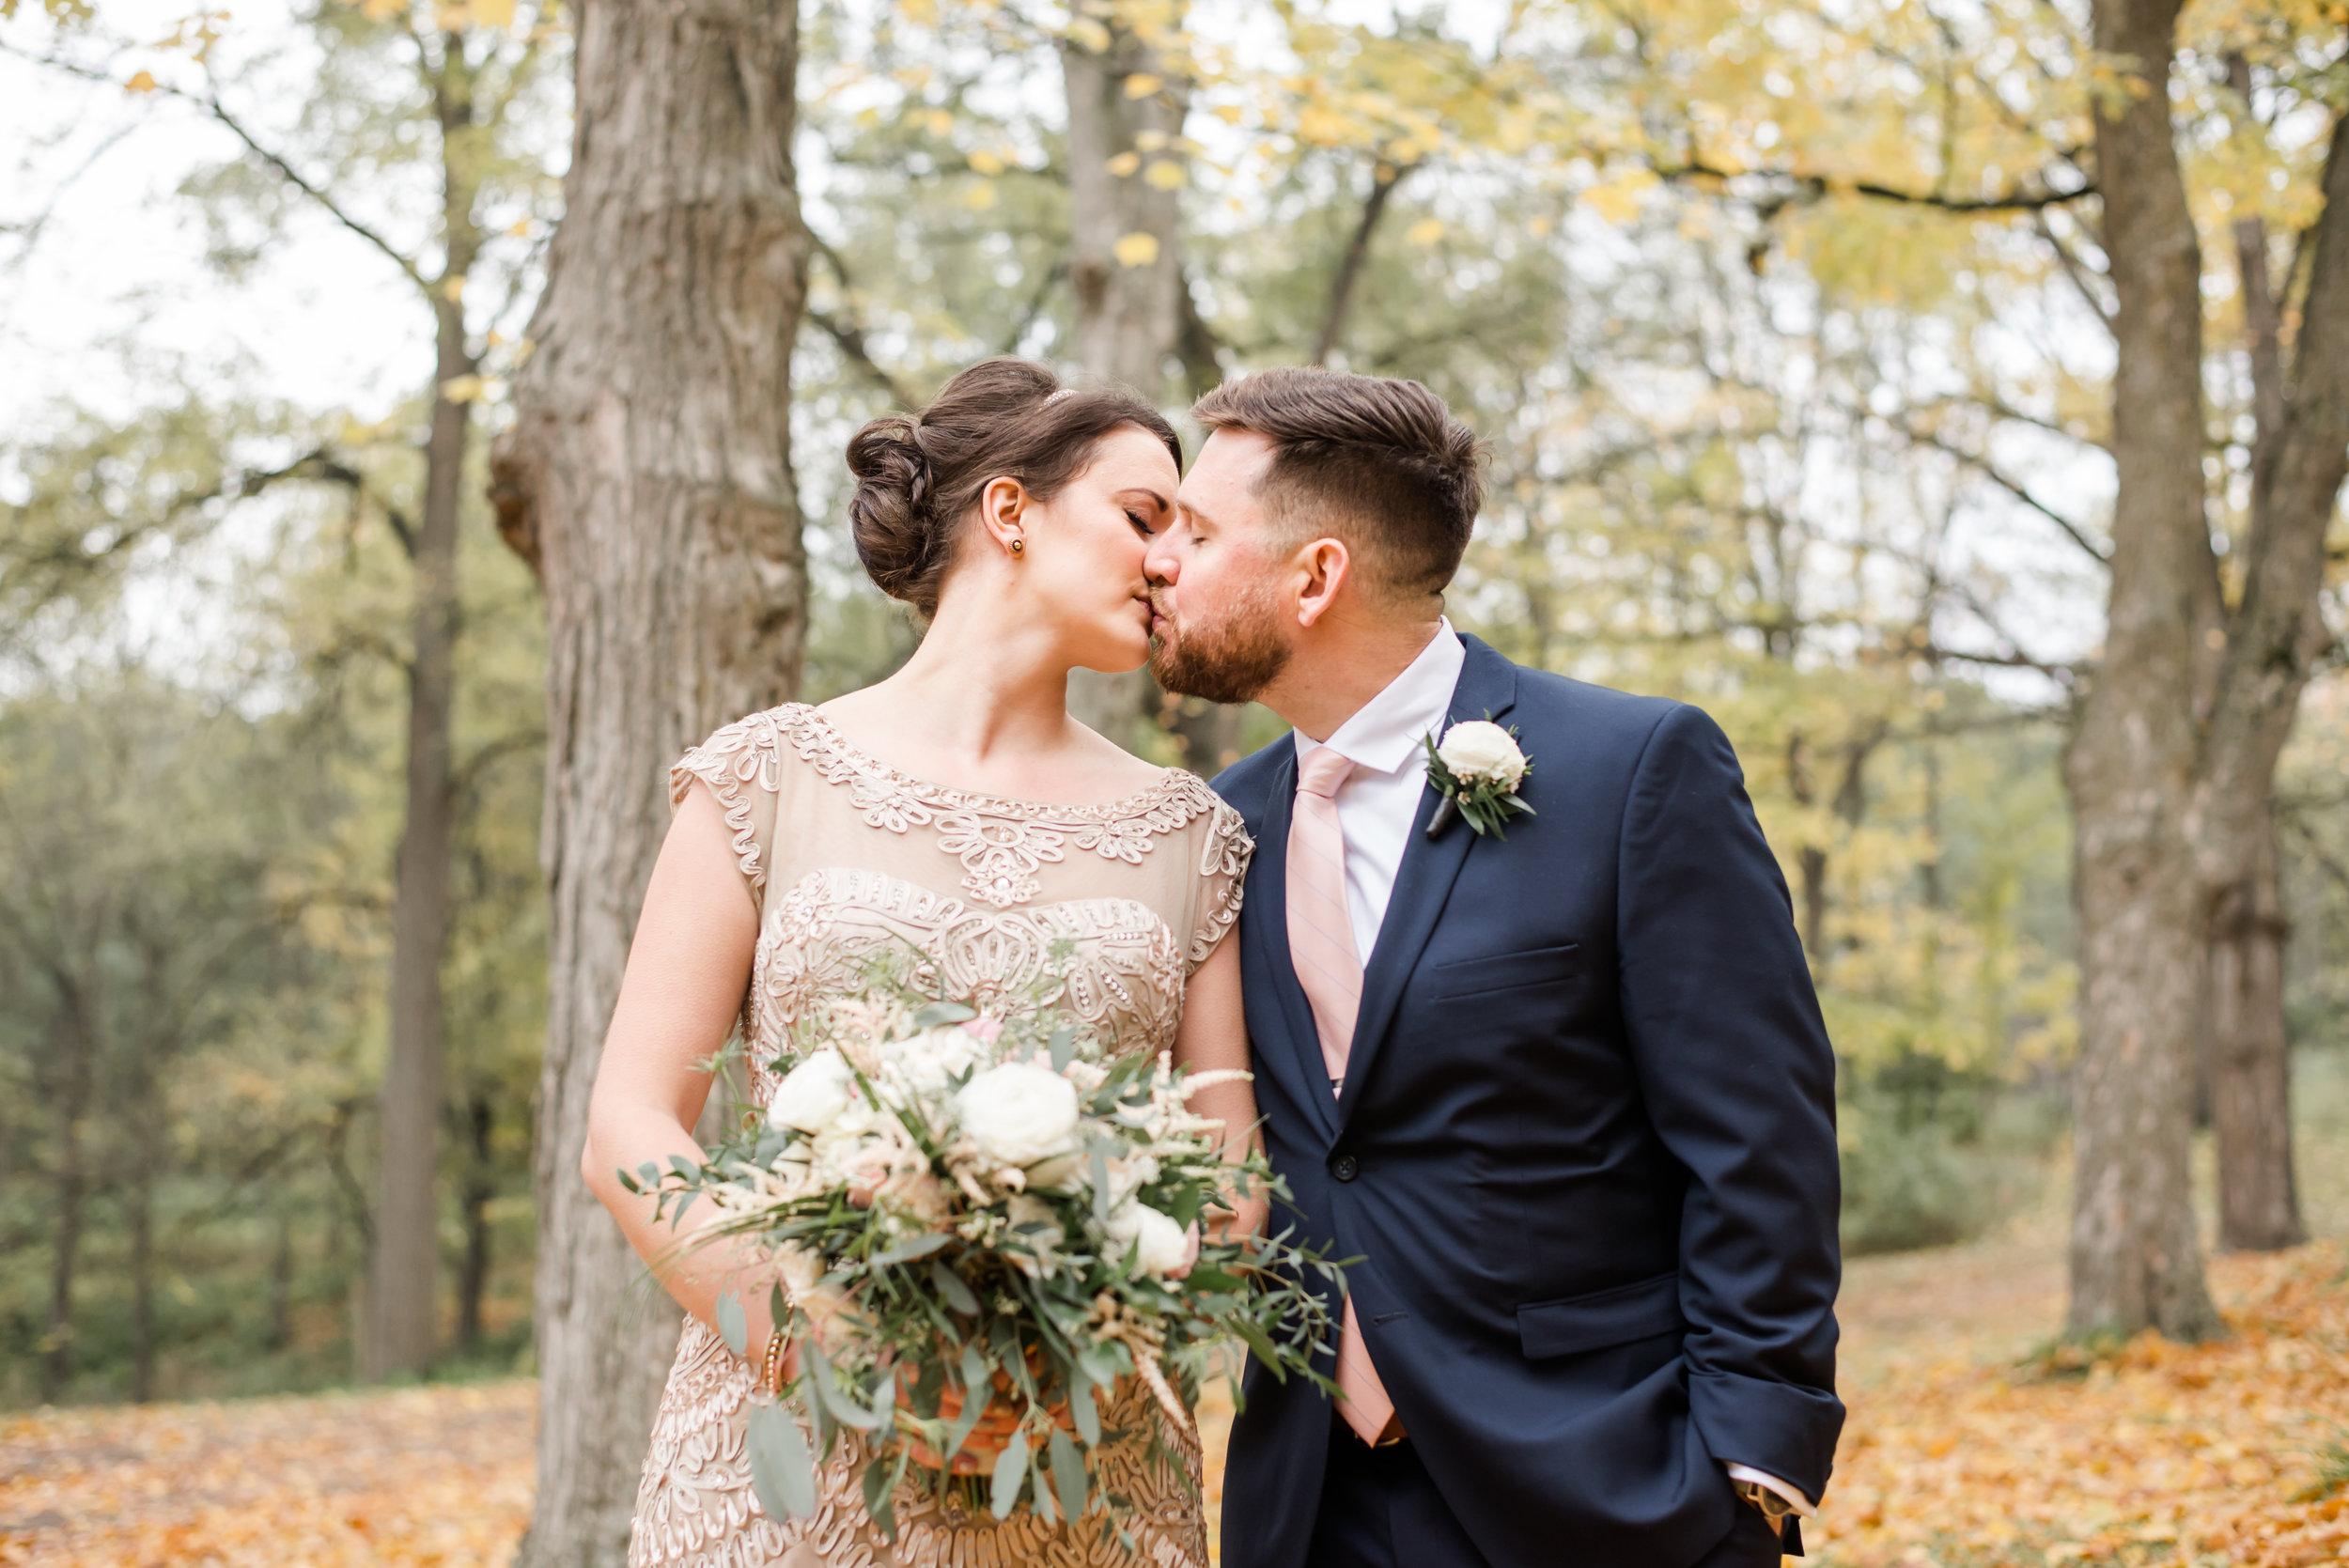 Julia & Dan Van Der Werf - Married October 20th, 2018The Ballroom & The Hideaway